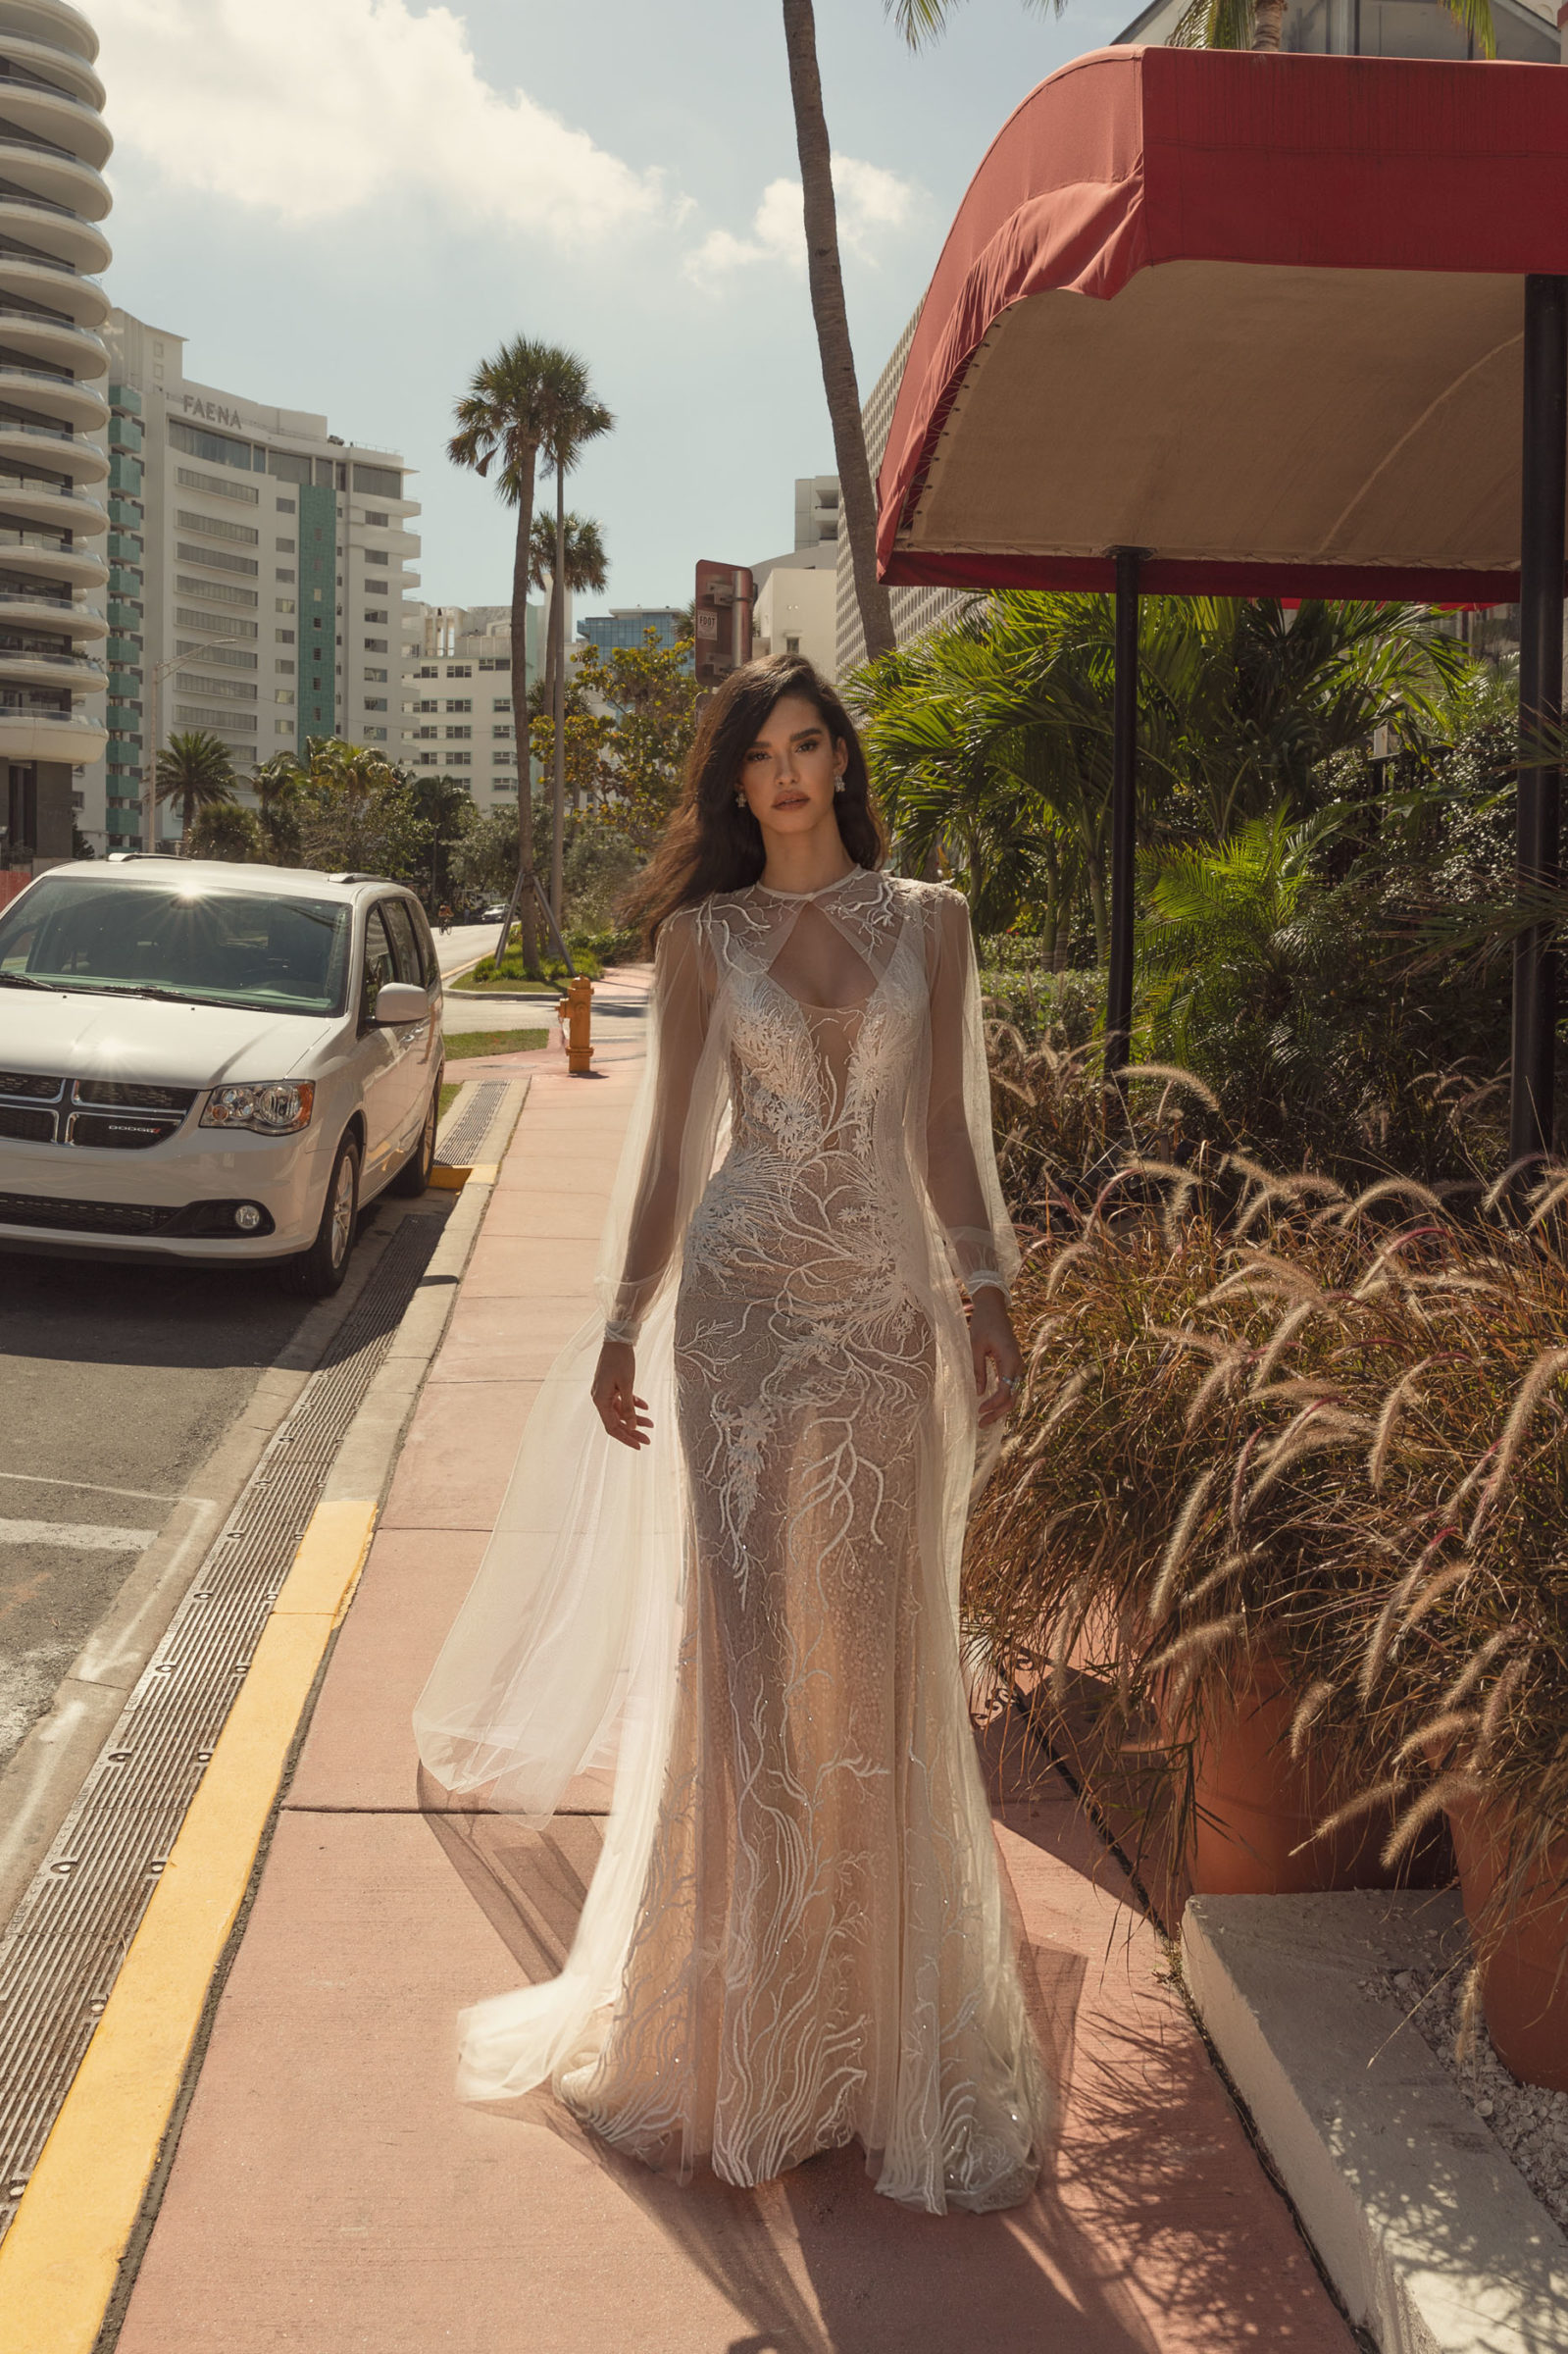 Bride wears long veil